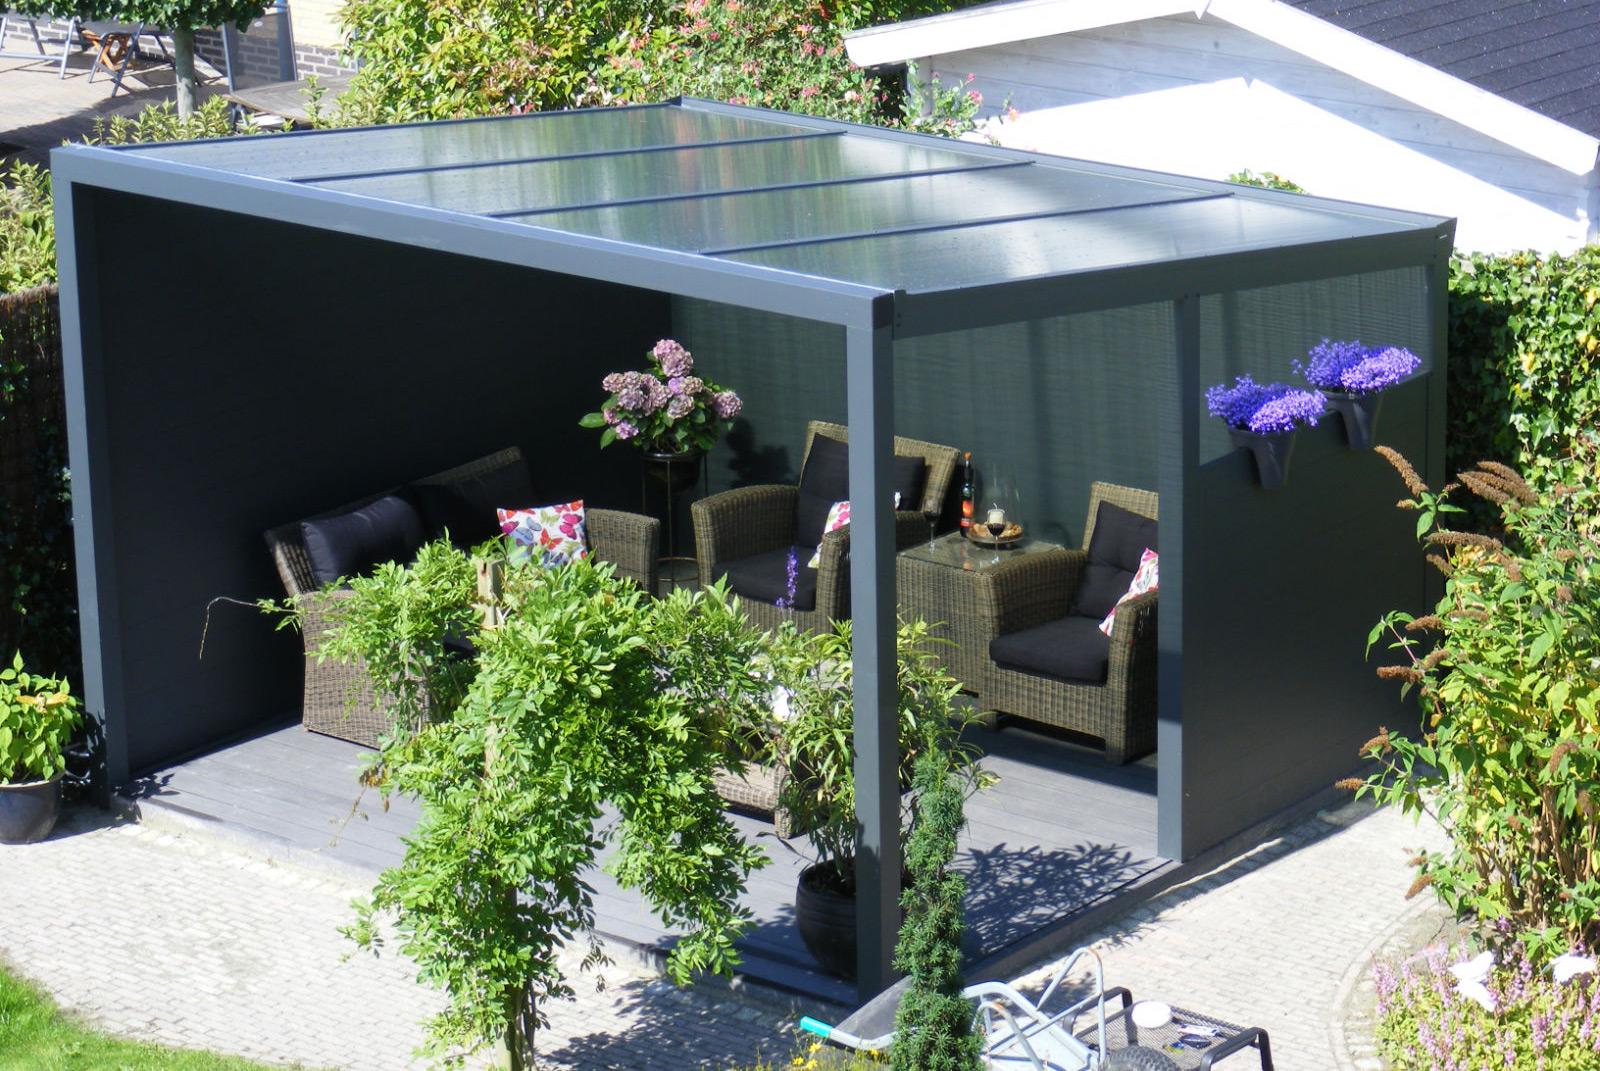 Terrassenuberdachung Alu Freistehend ~ Terrassendach aluminium ueberdachungen polycarbonat m